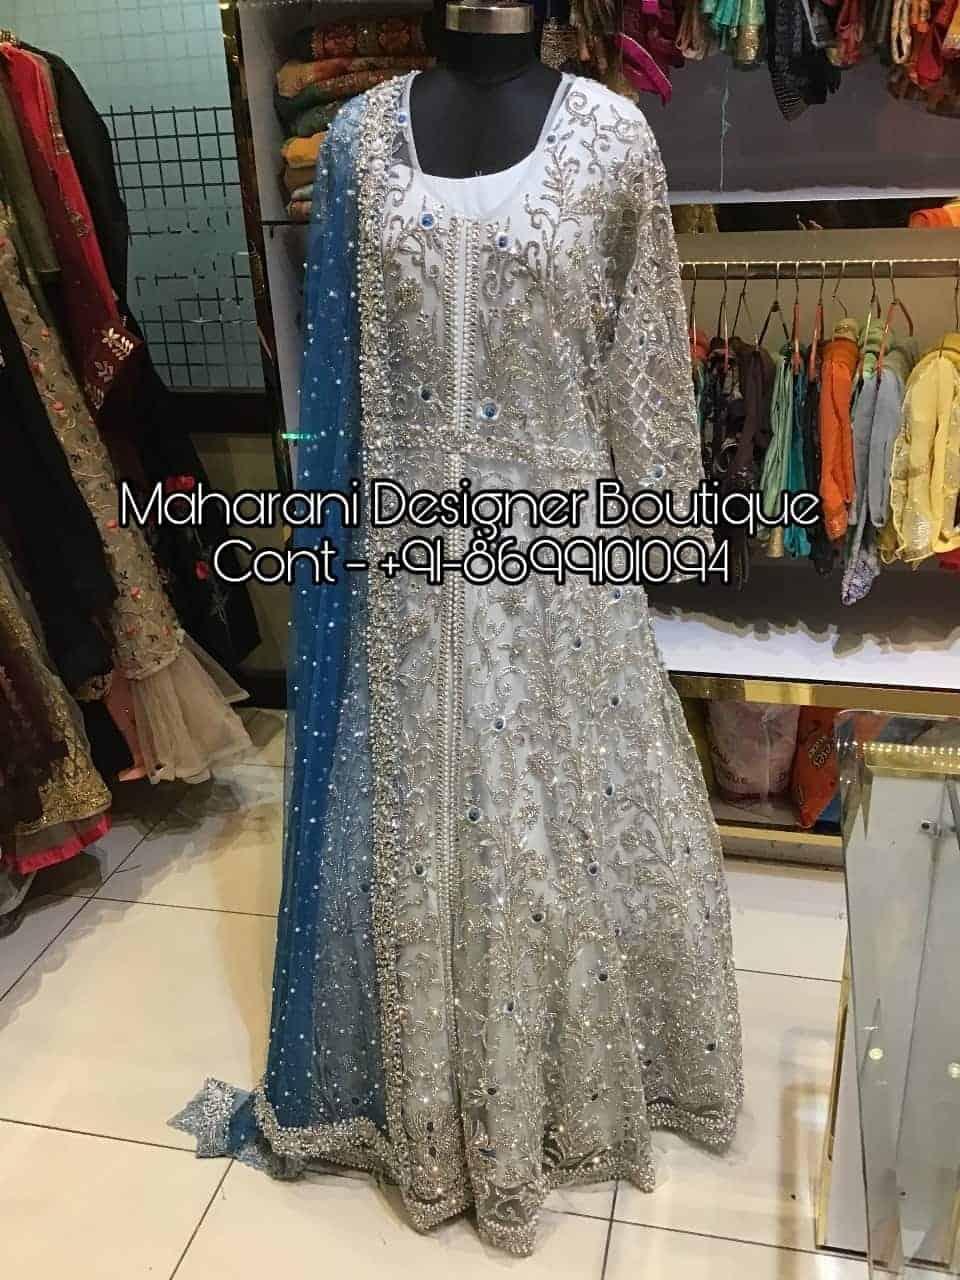 1091dae75eff bridal dress, bridal dress for reception, bridal dresses near me, bridal  dress near